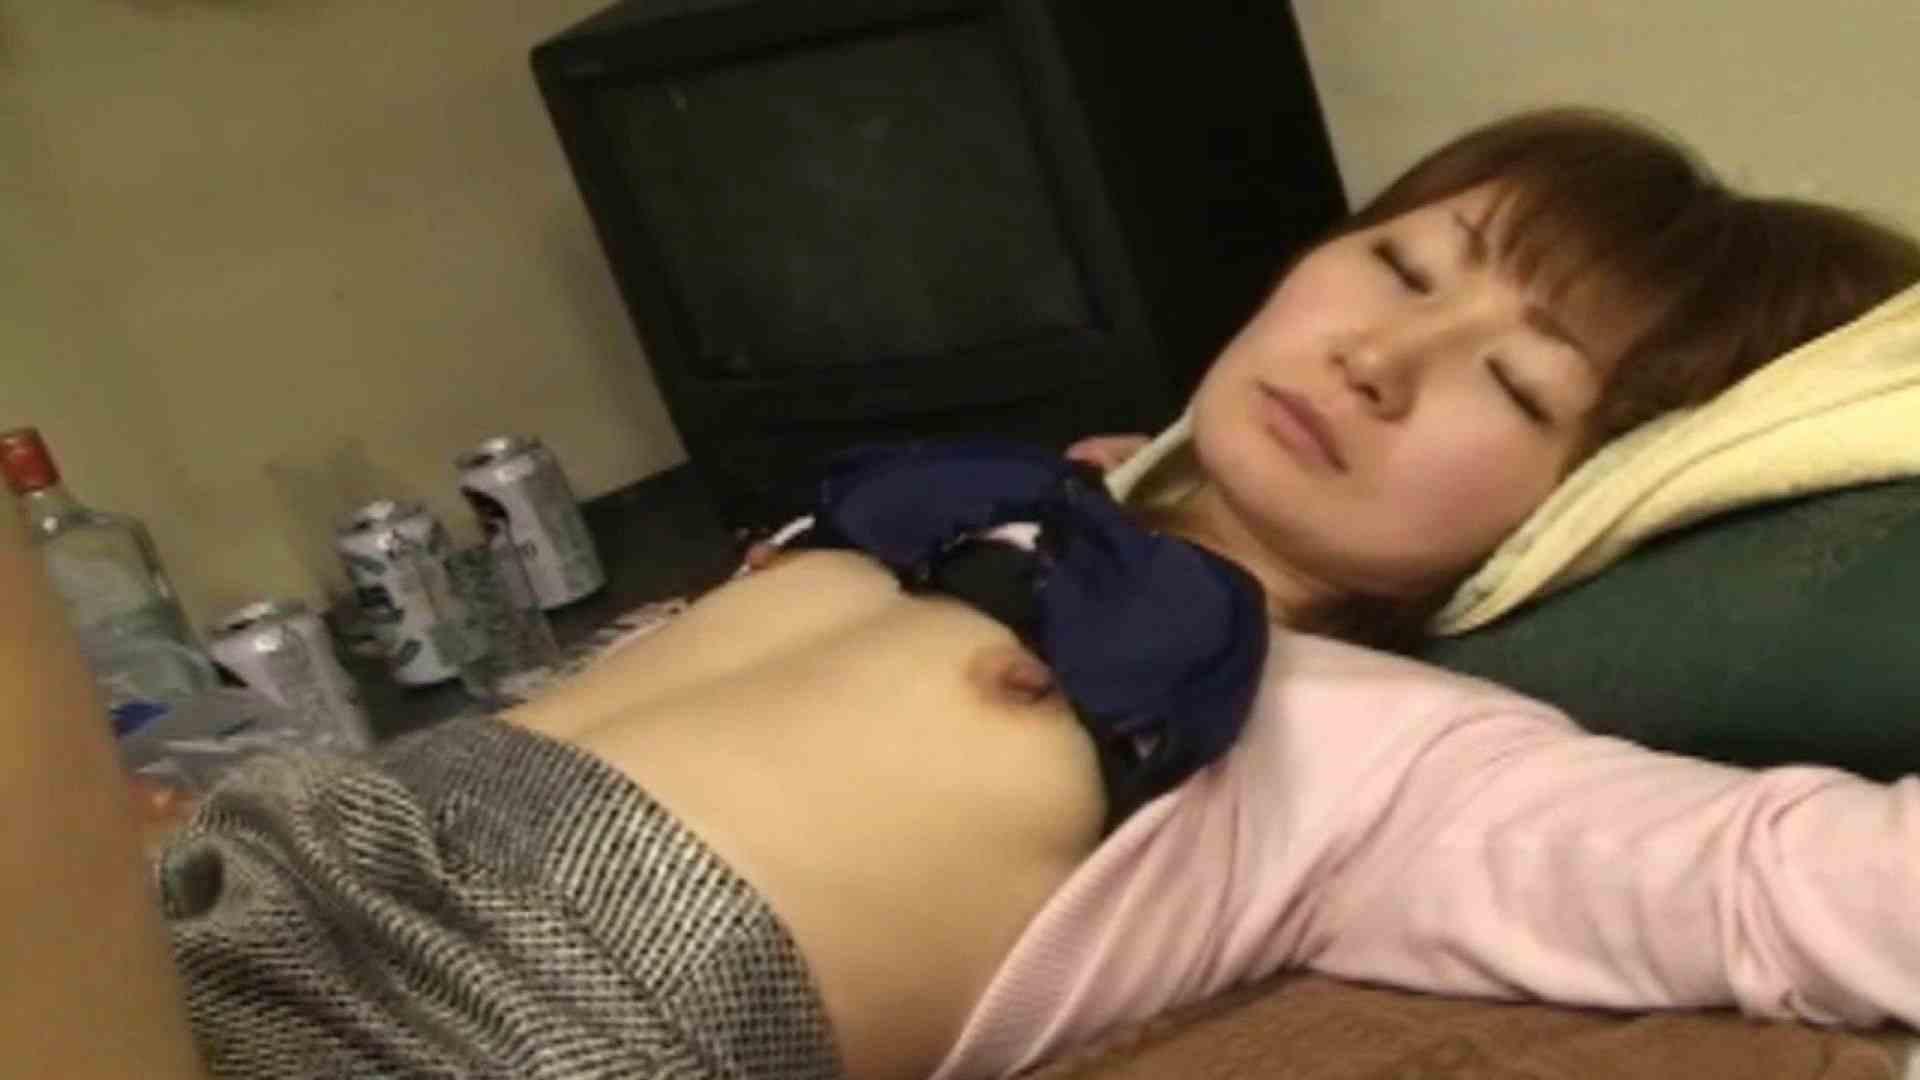 S級厳選美女ビッチガールVol.07 美女 AV無料 91連発 82